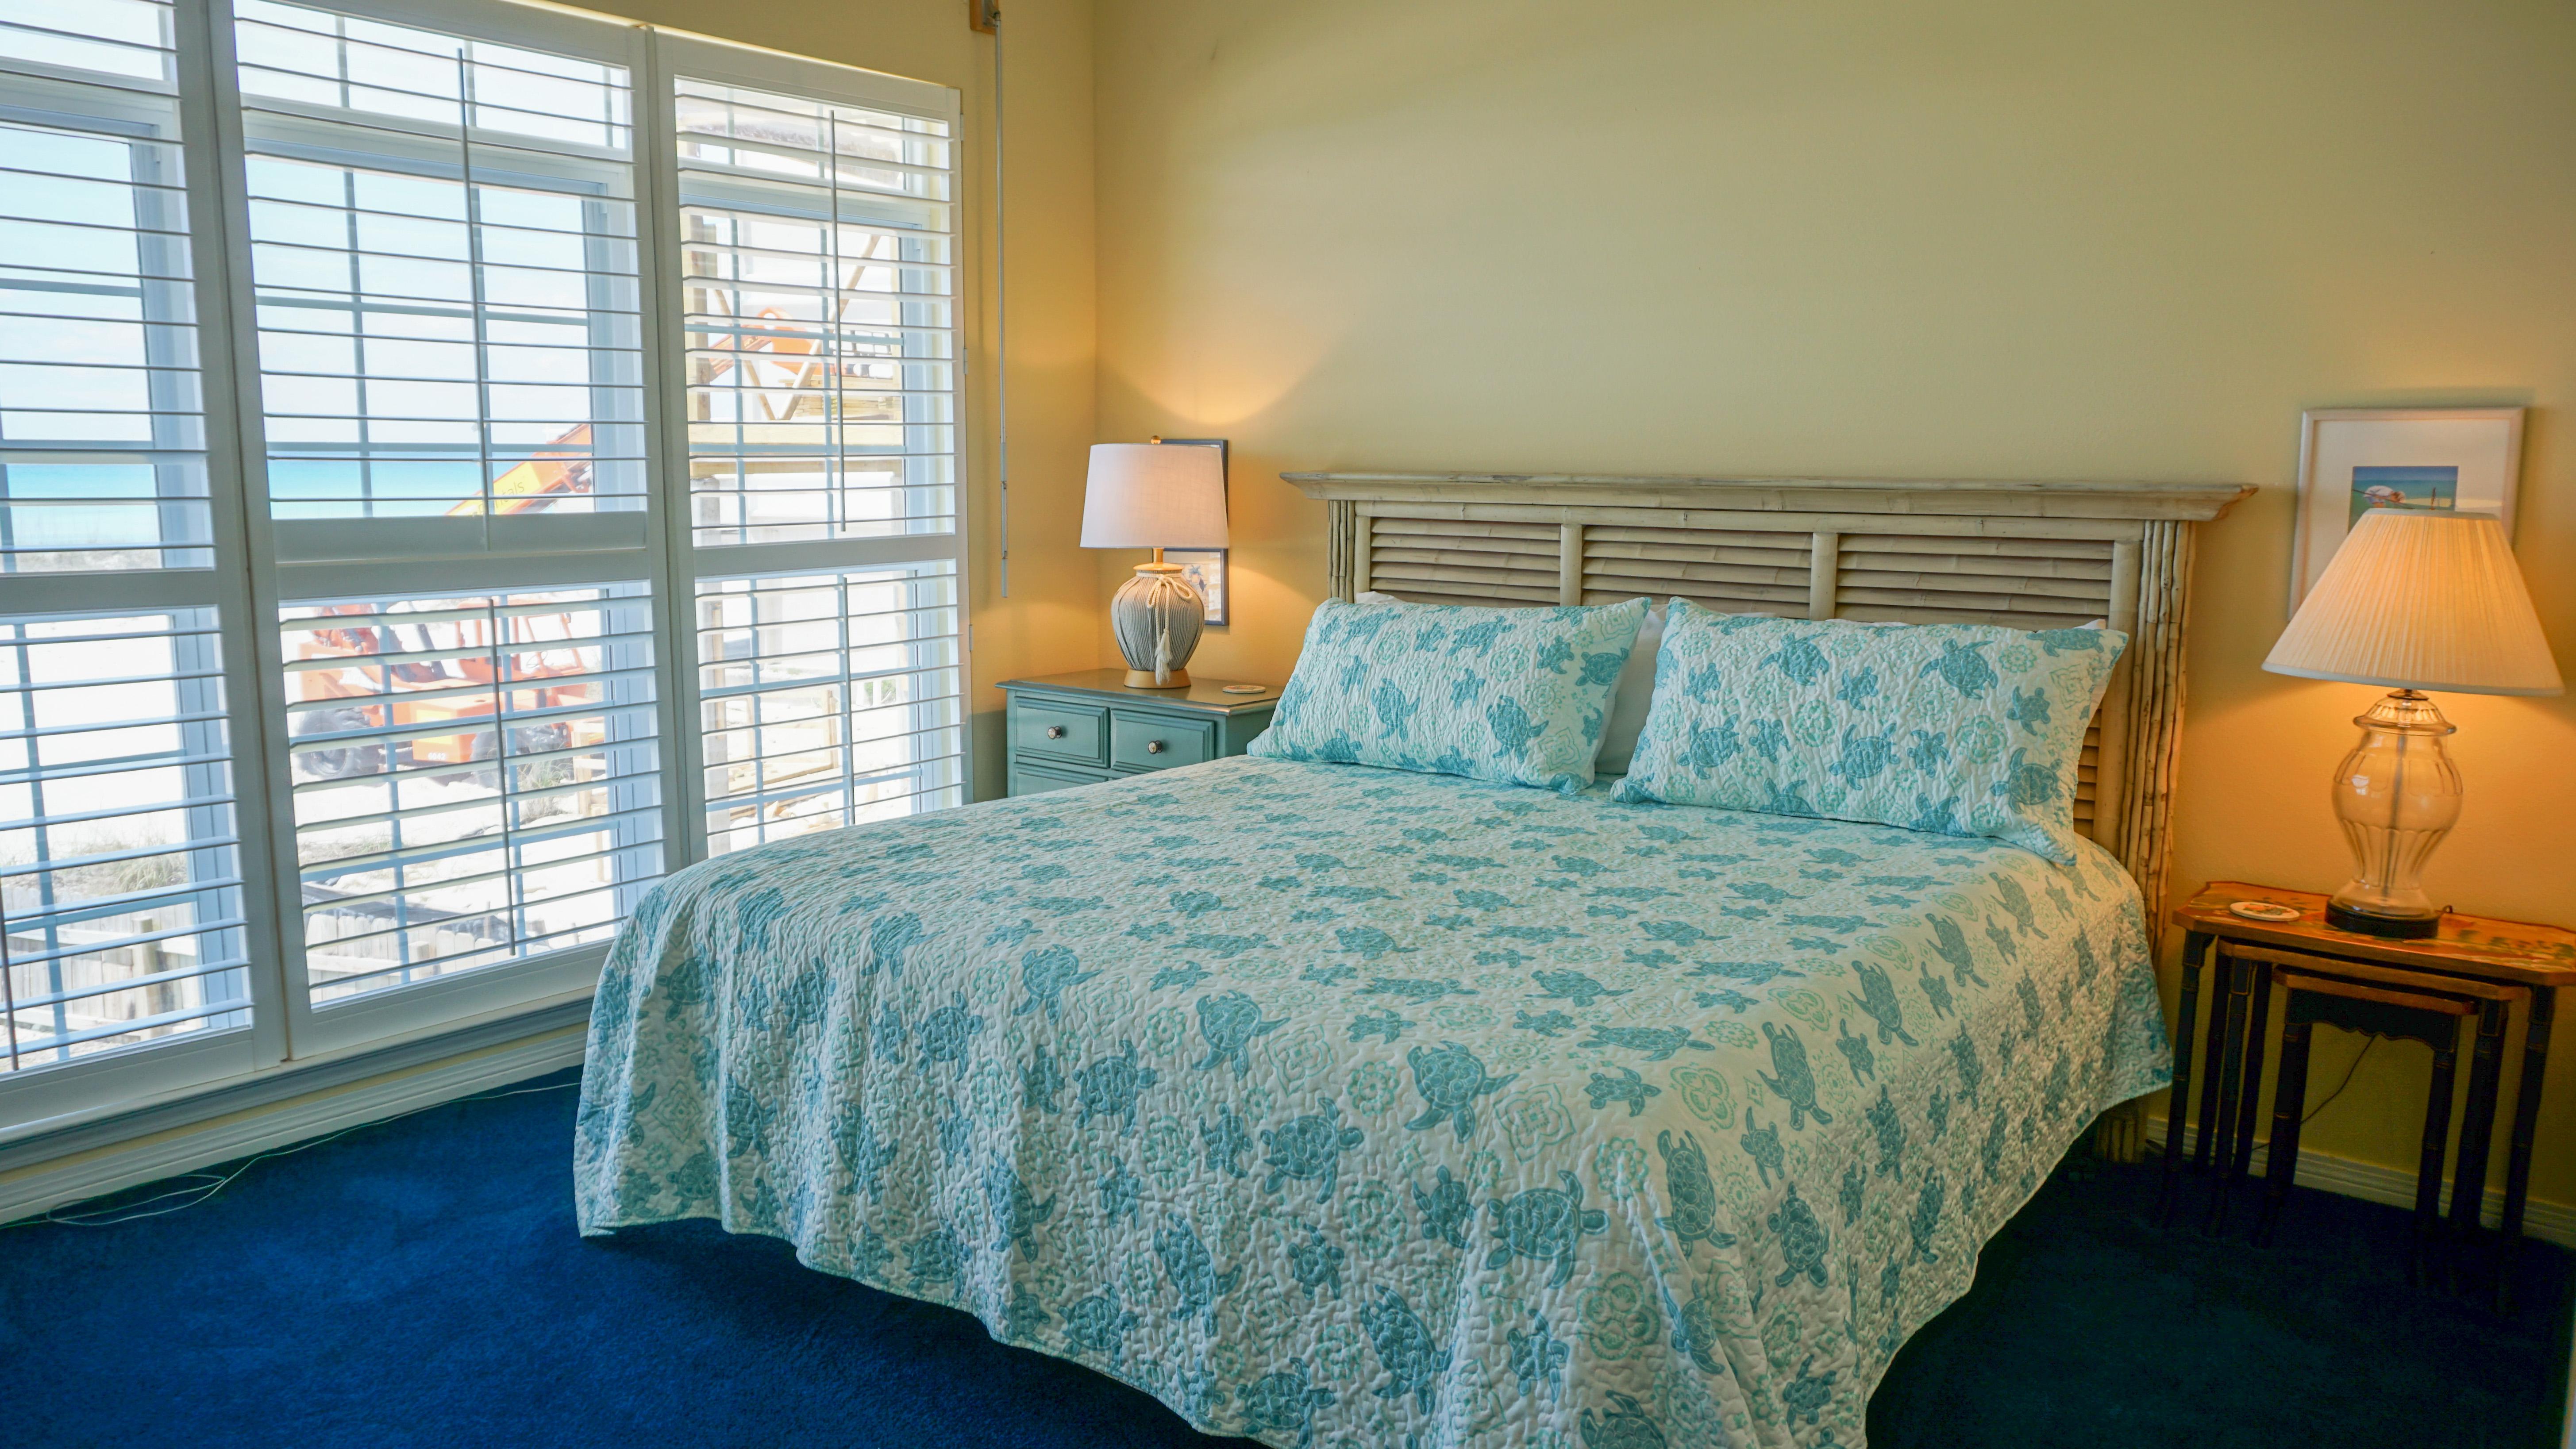 Ensenada Cinco 1730 House/Cottage rental in Pensacola Beach House Rentals in Pensacola Beach Florida - #22